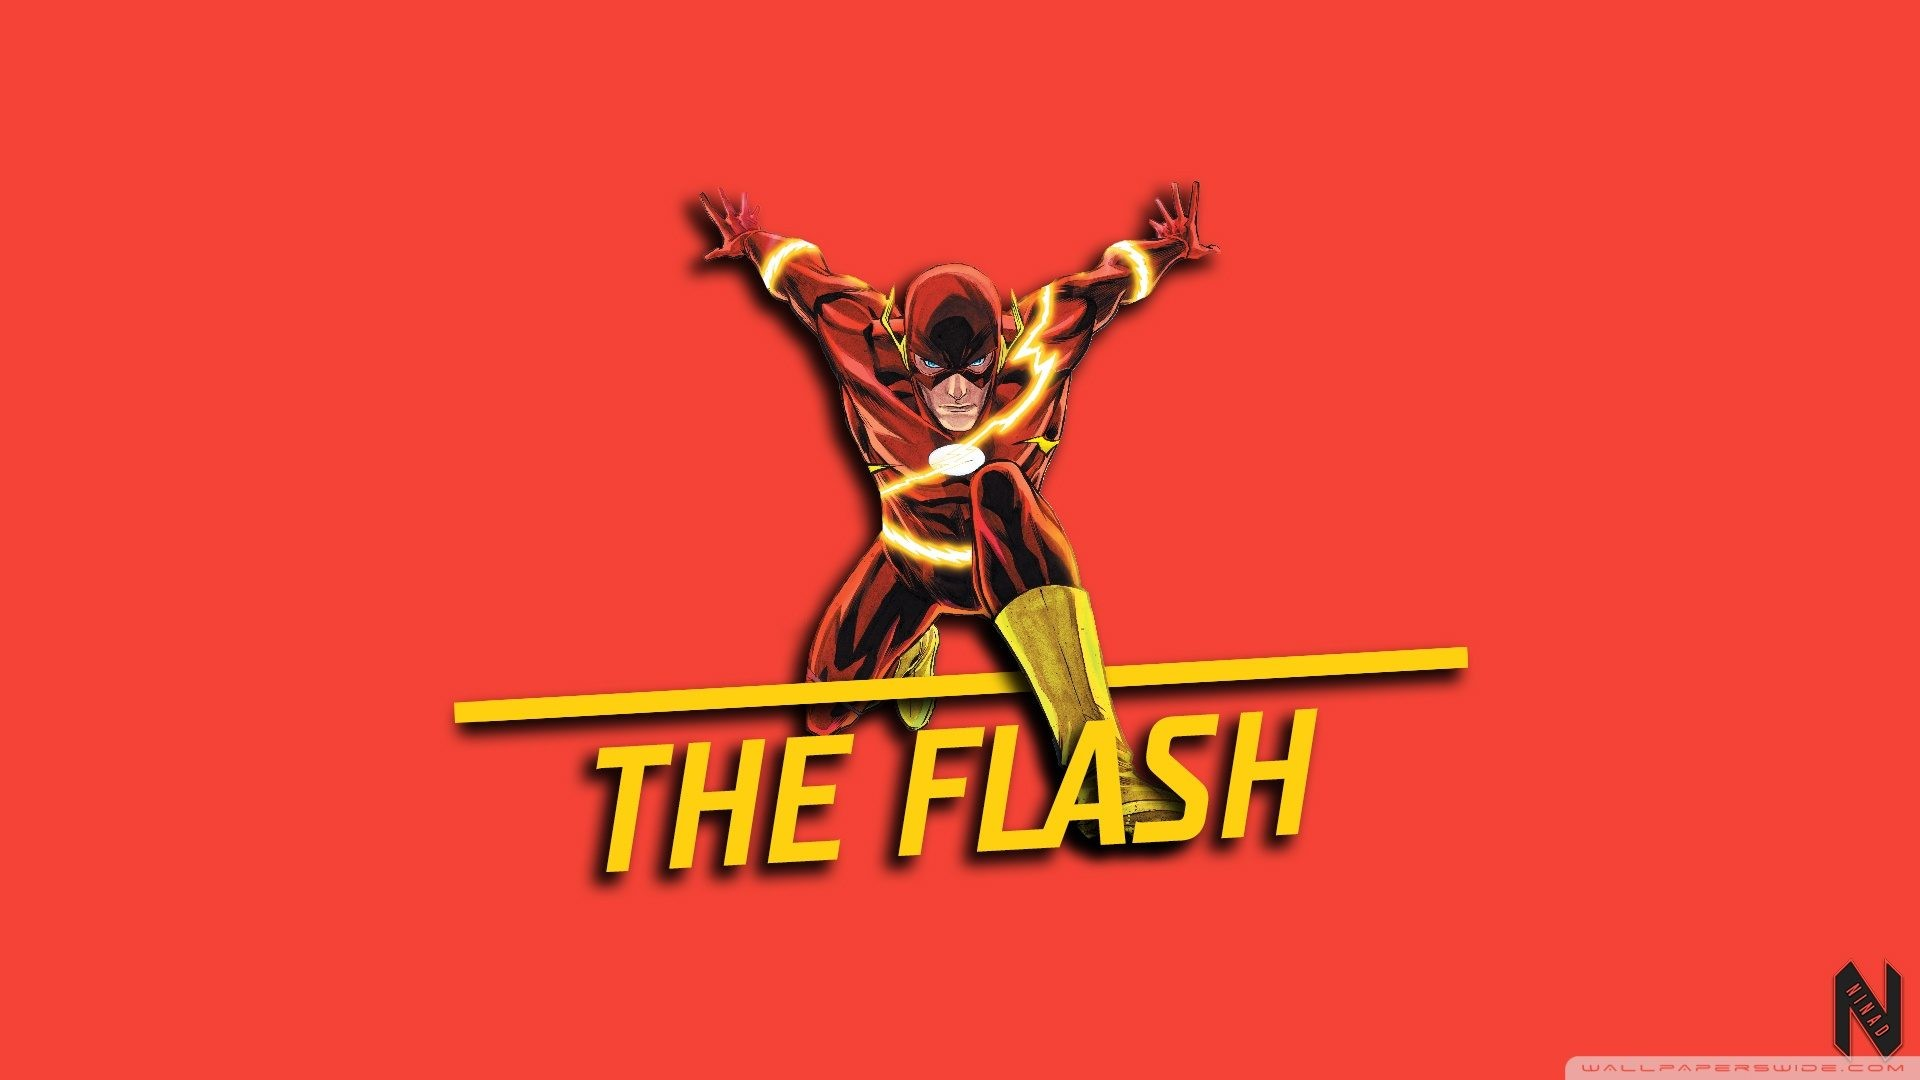 The Flash 4K HD wallpaper